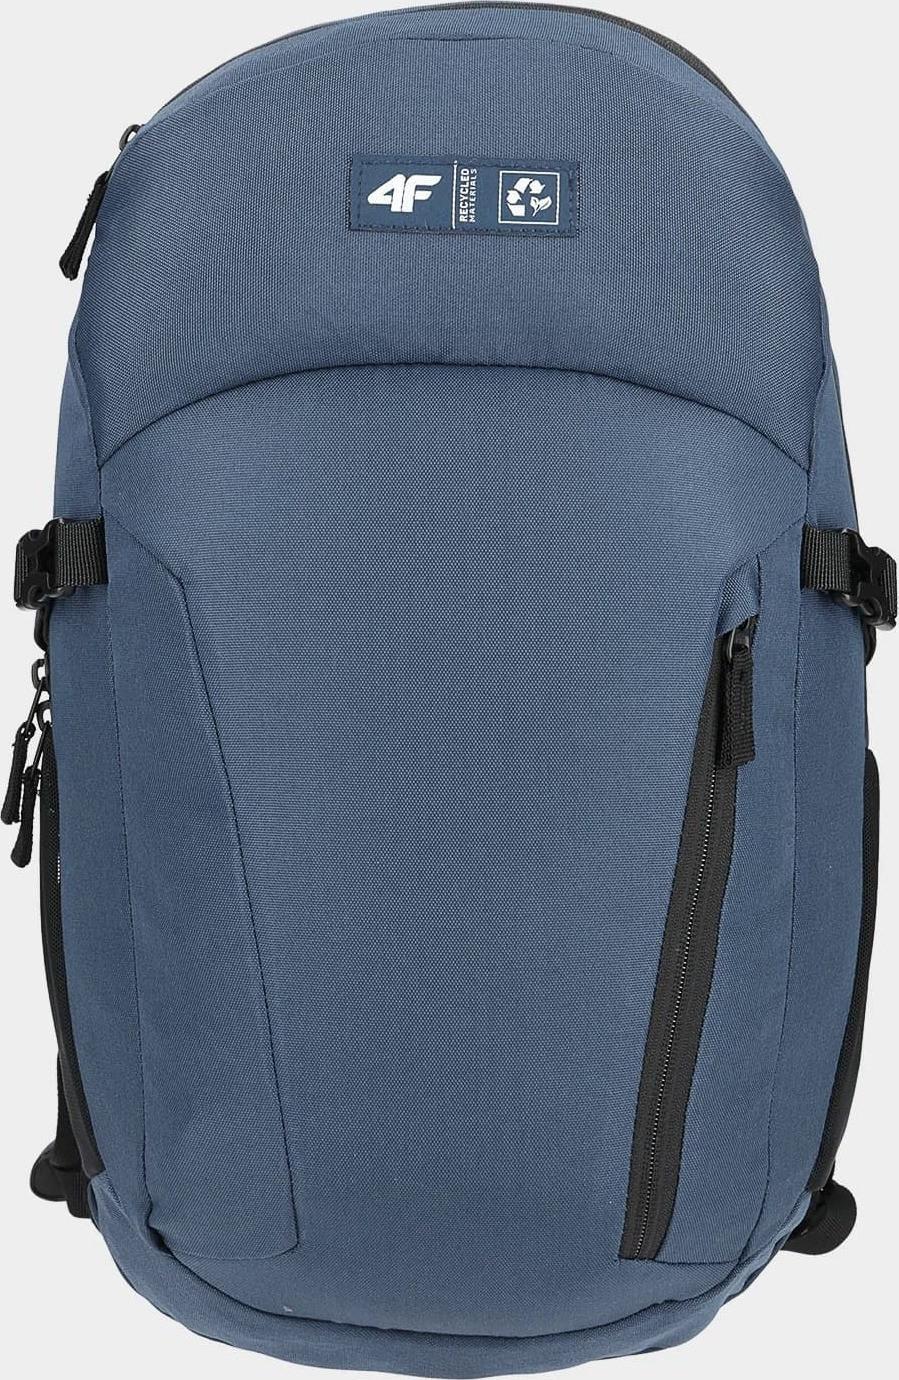 Mestský ruksak 4F PCU207 Tmavomodrý modrá 17L